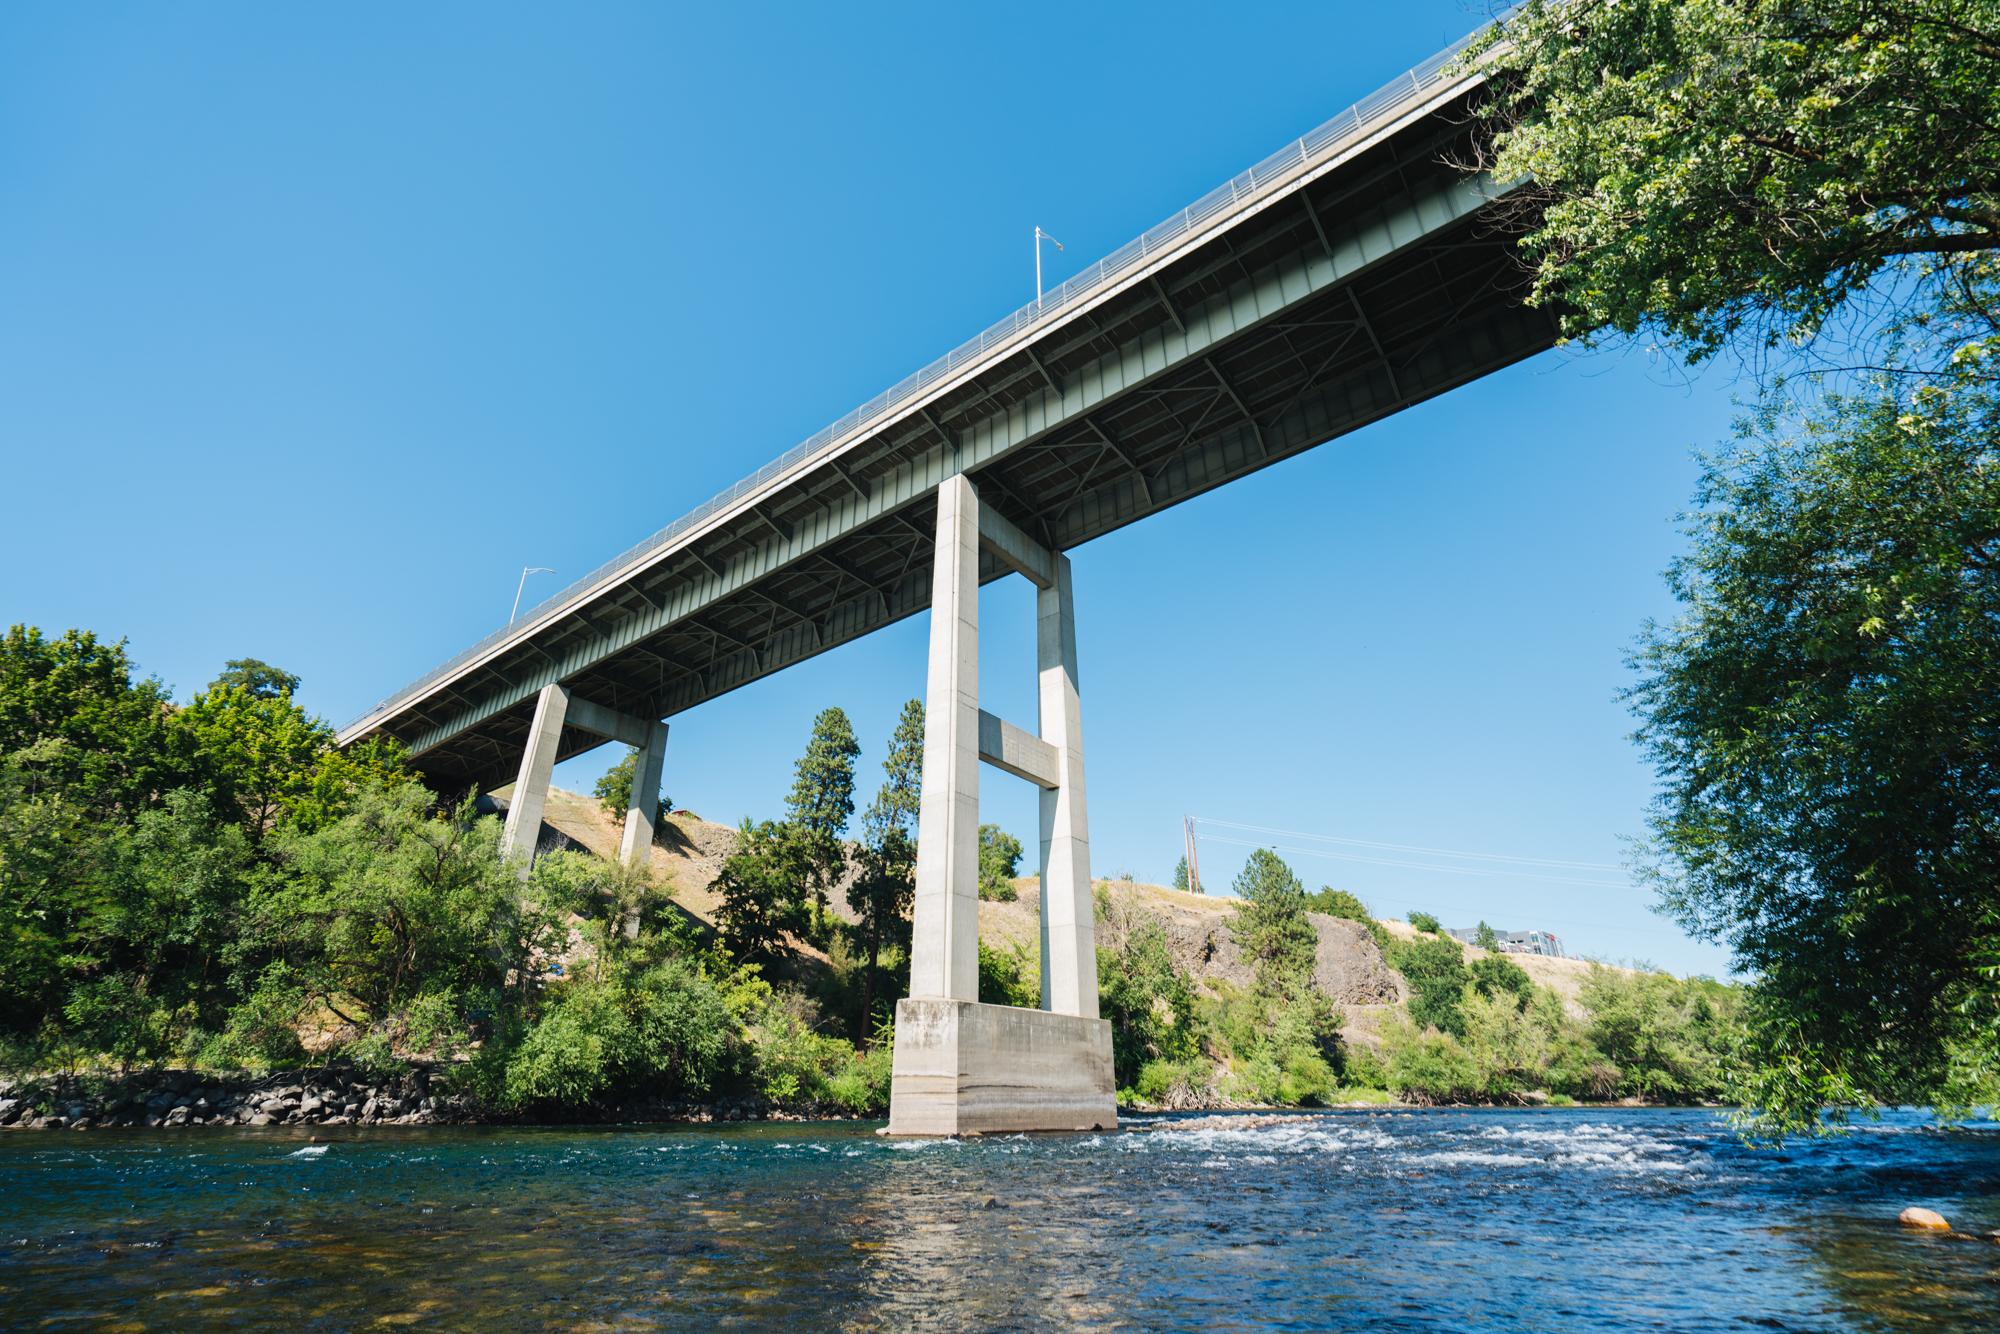 spokane washington maple street bridge river boat launch recreation